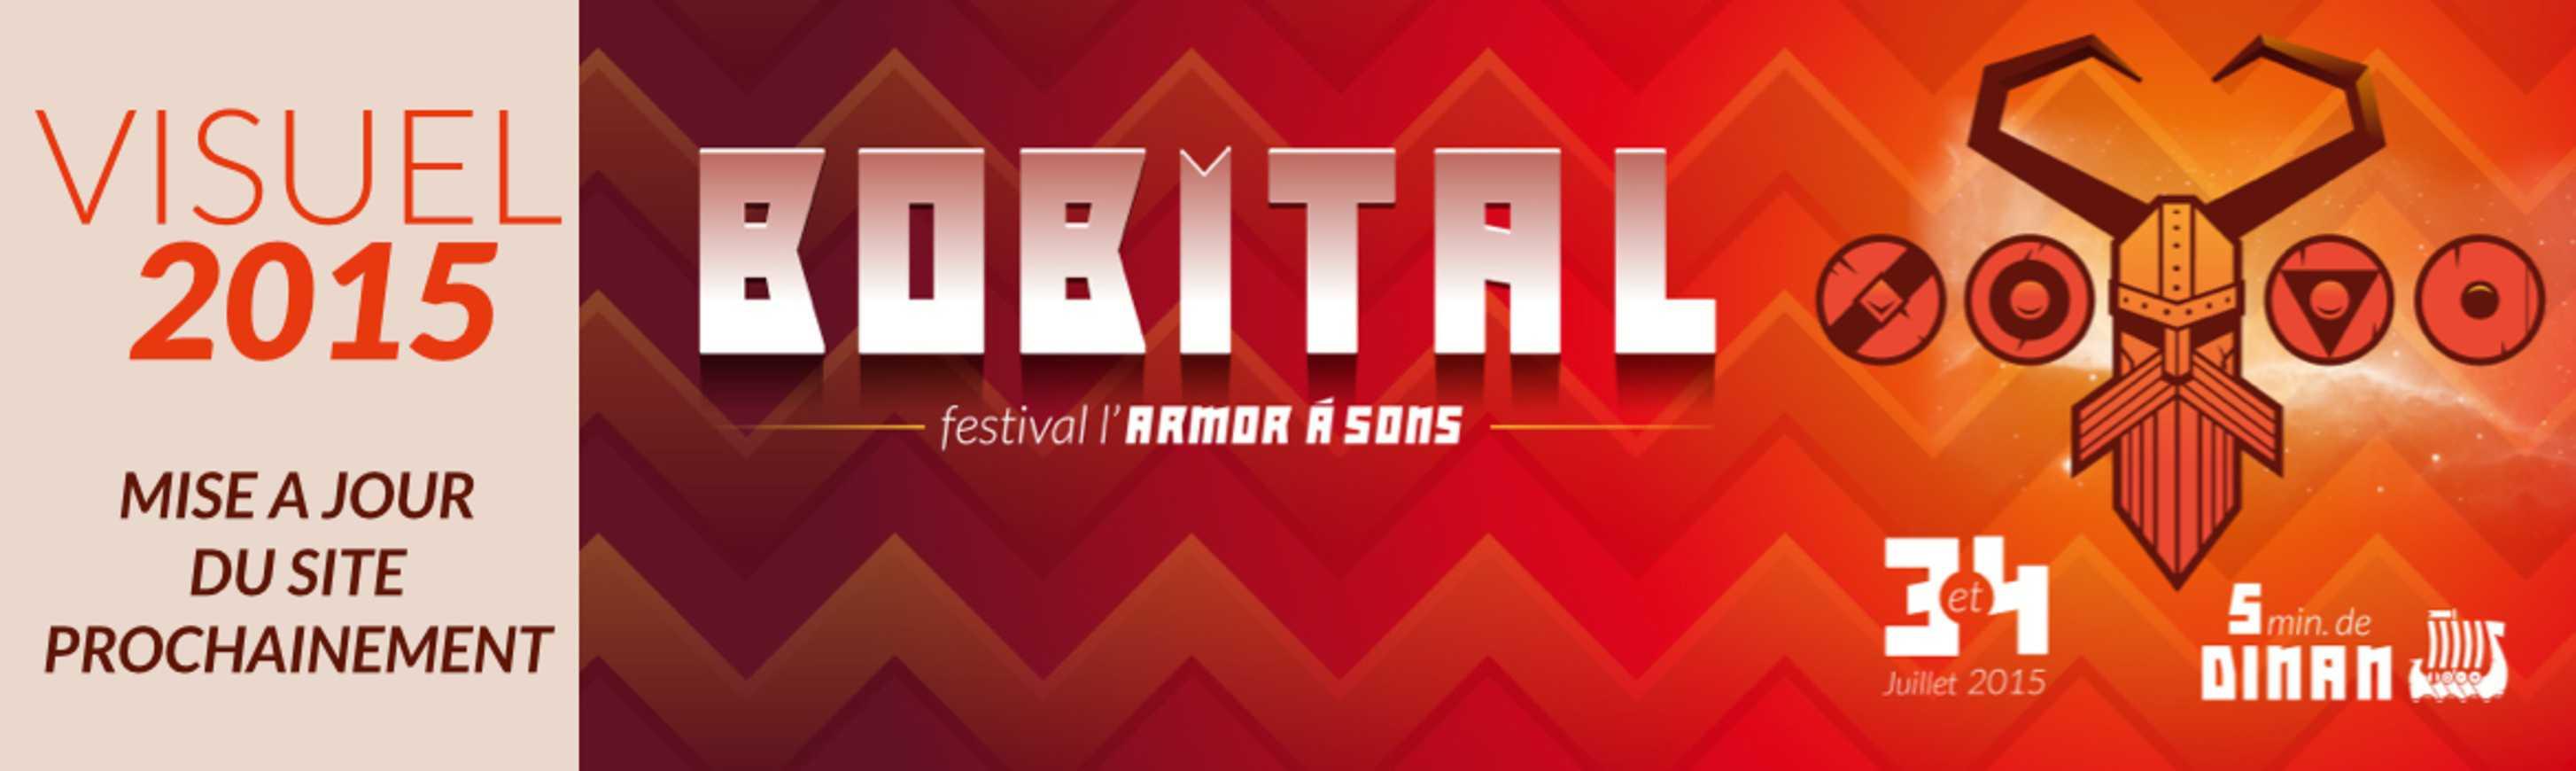 Bobital approche visu2015.001